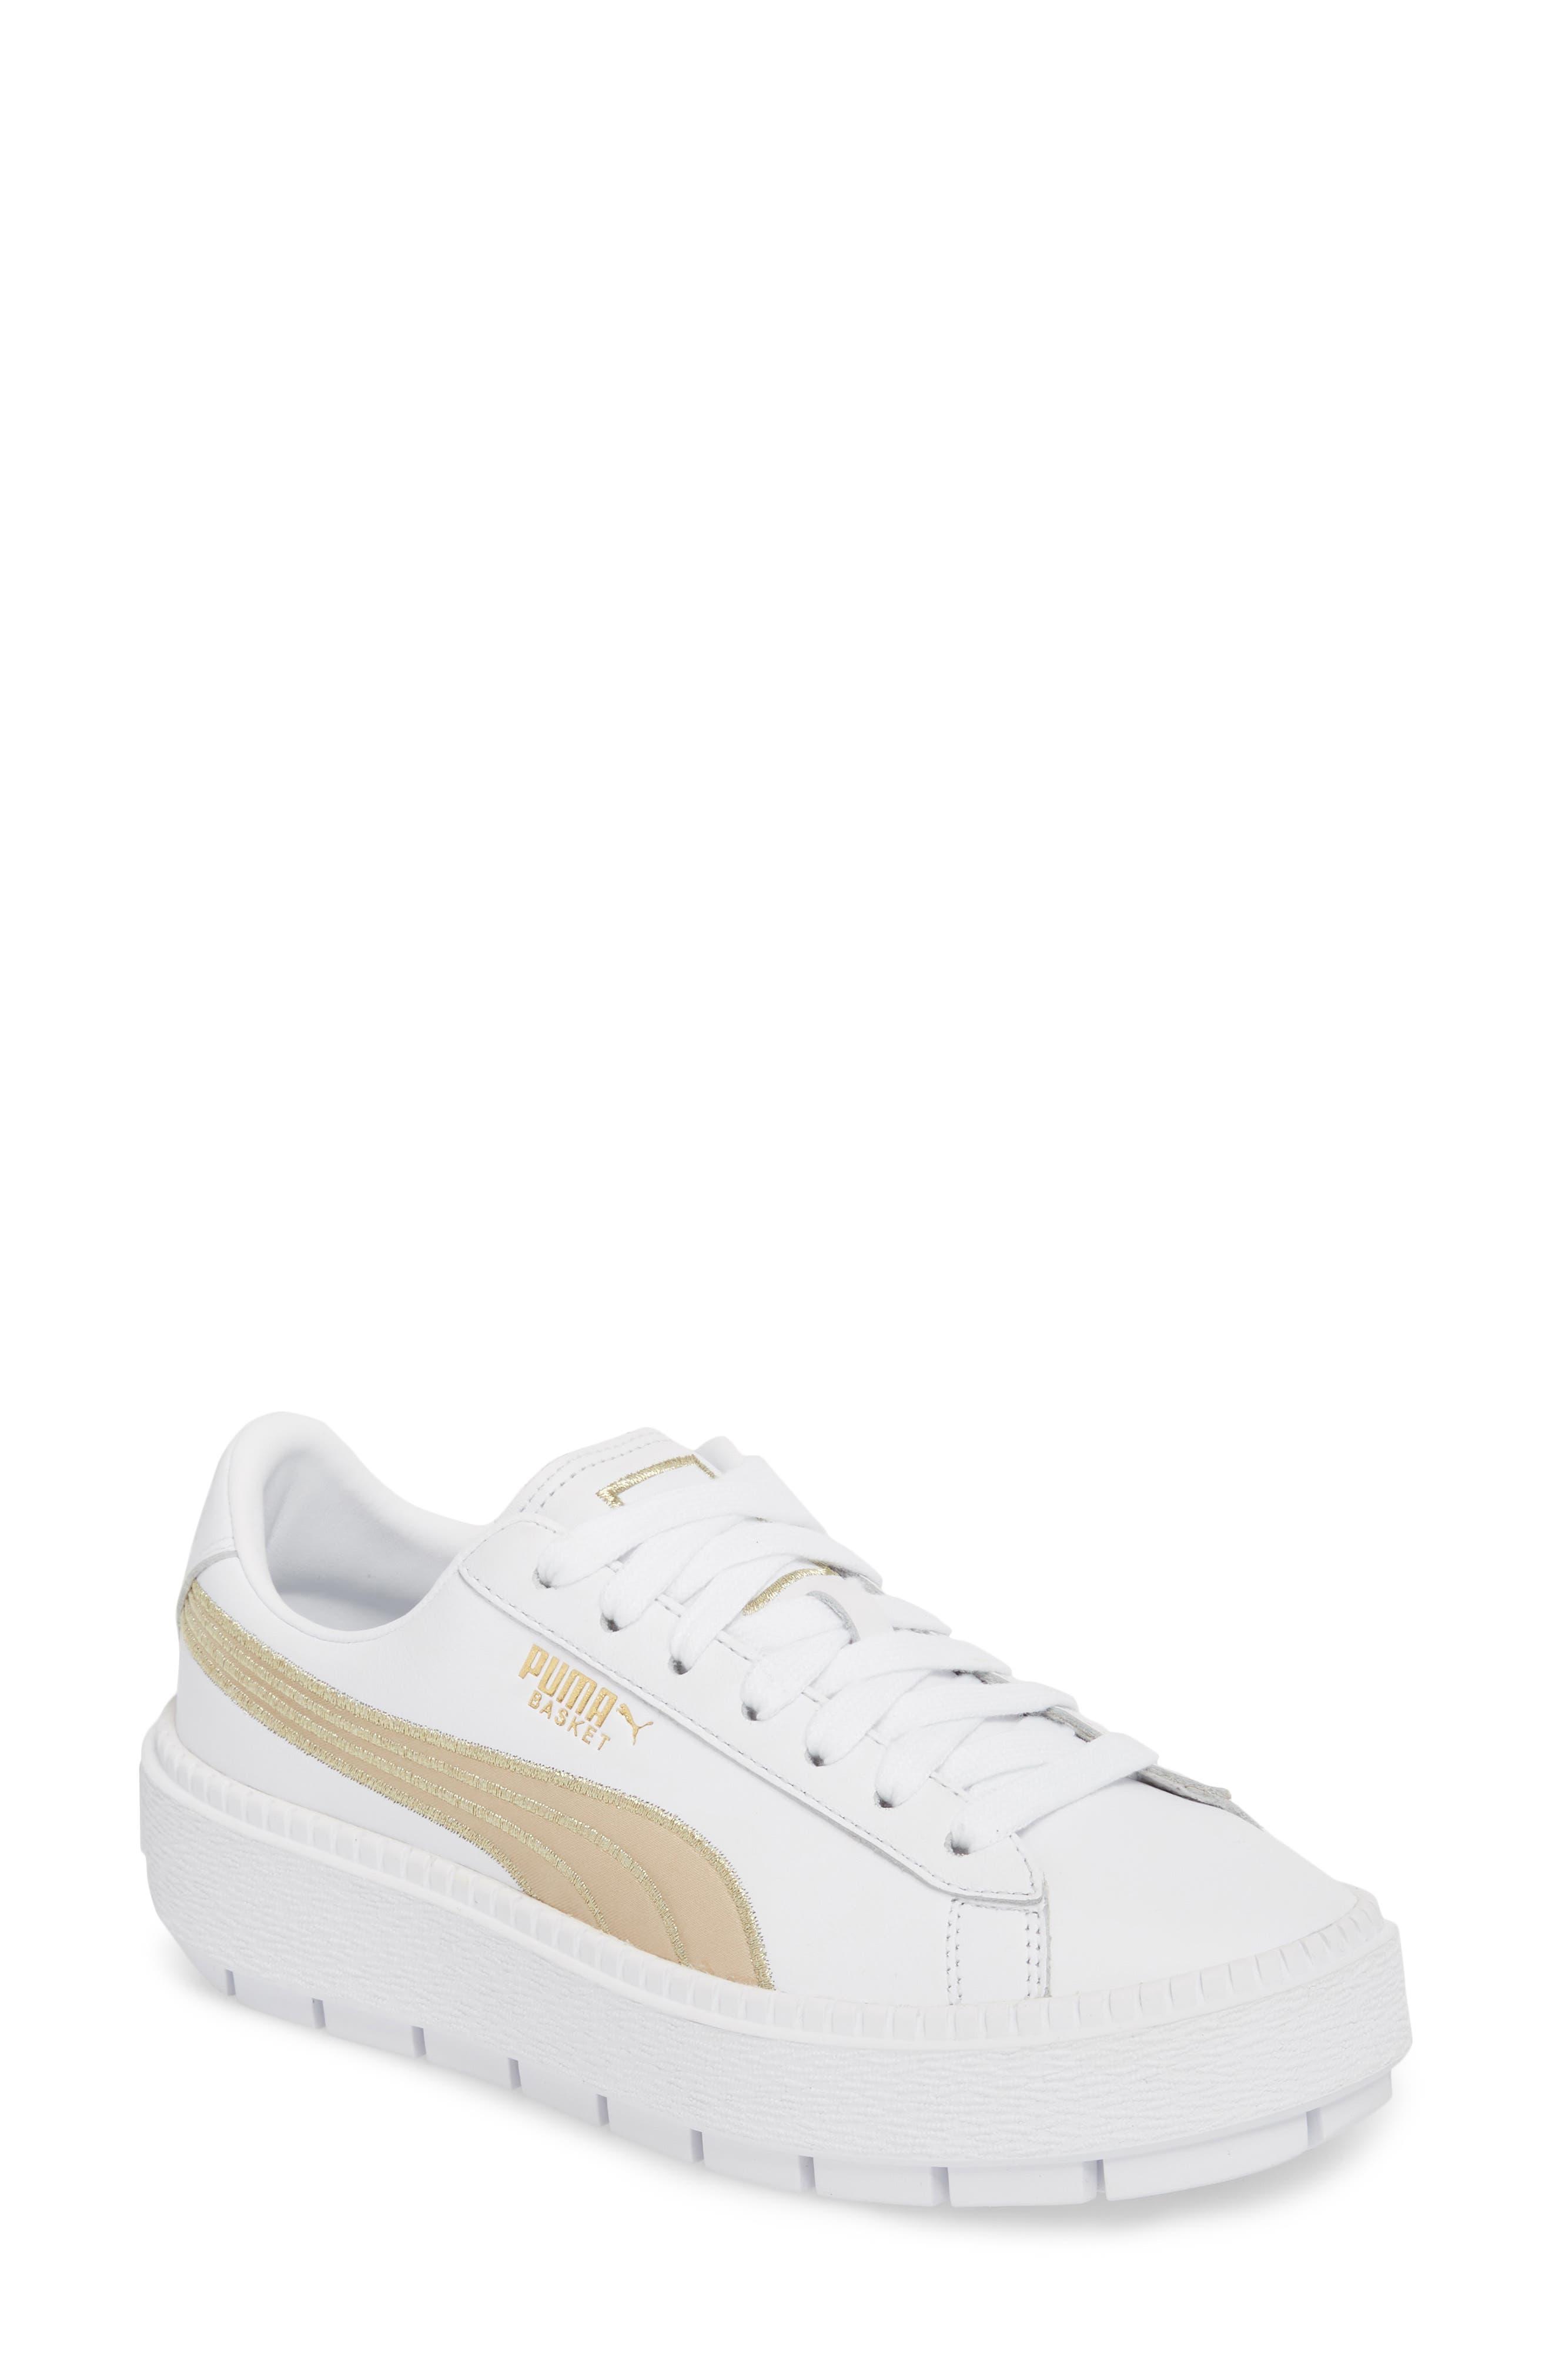 Platform Trace Sneaker,                             Main thumbnail 1, color,                             Puma White/ Metallic Gold